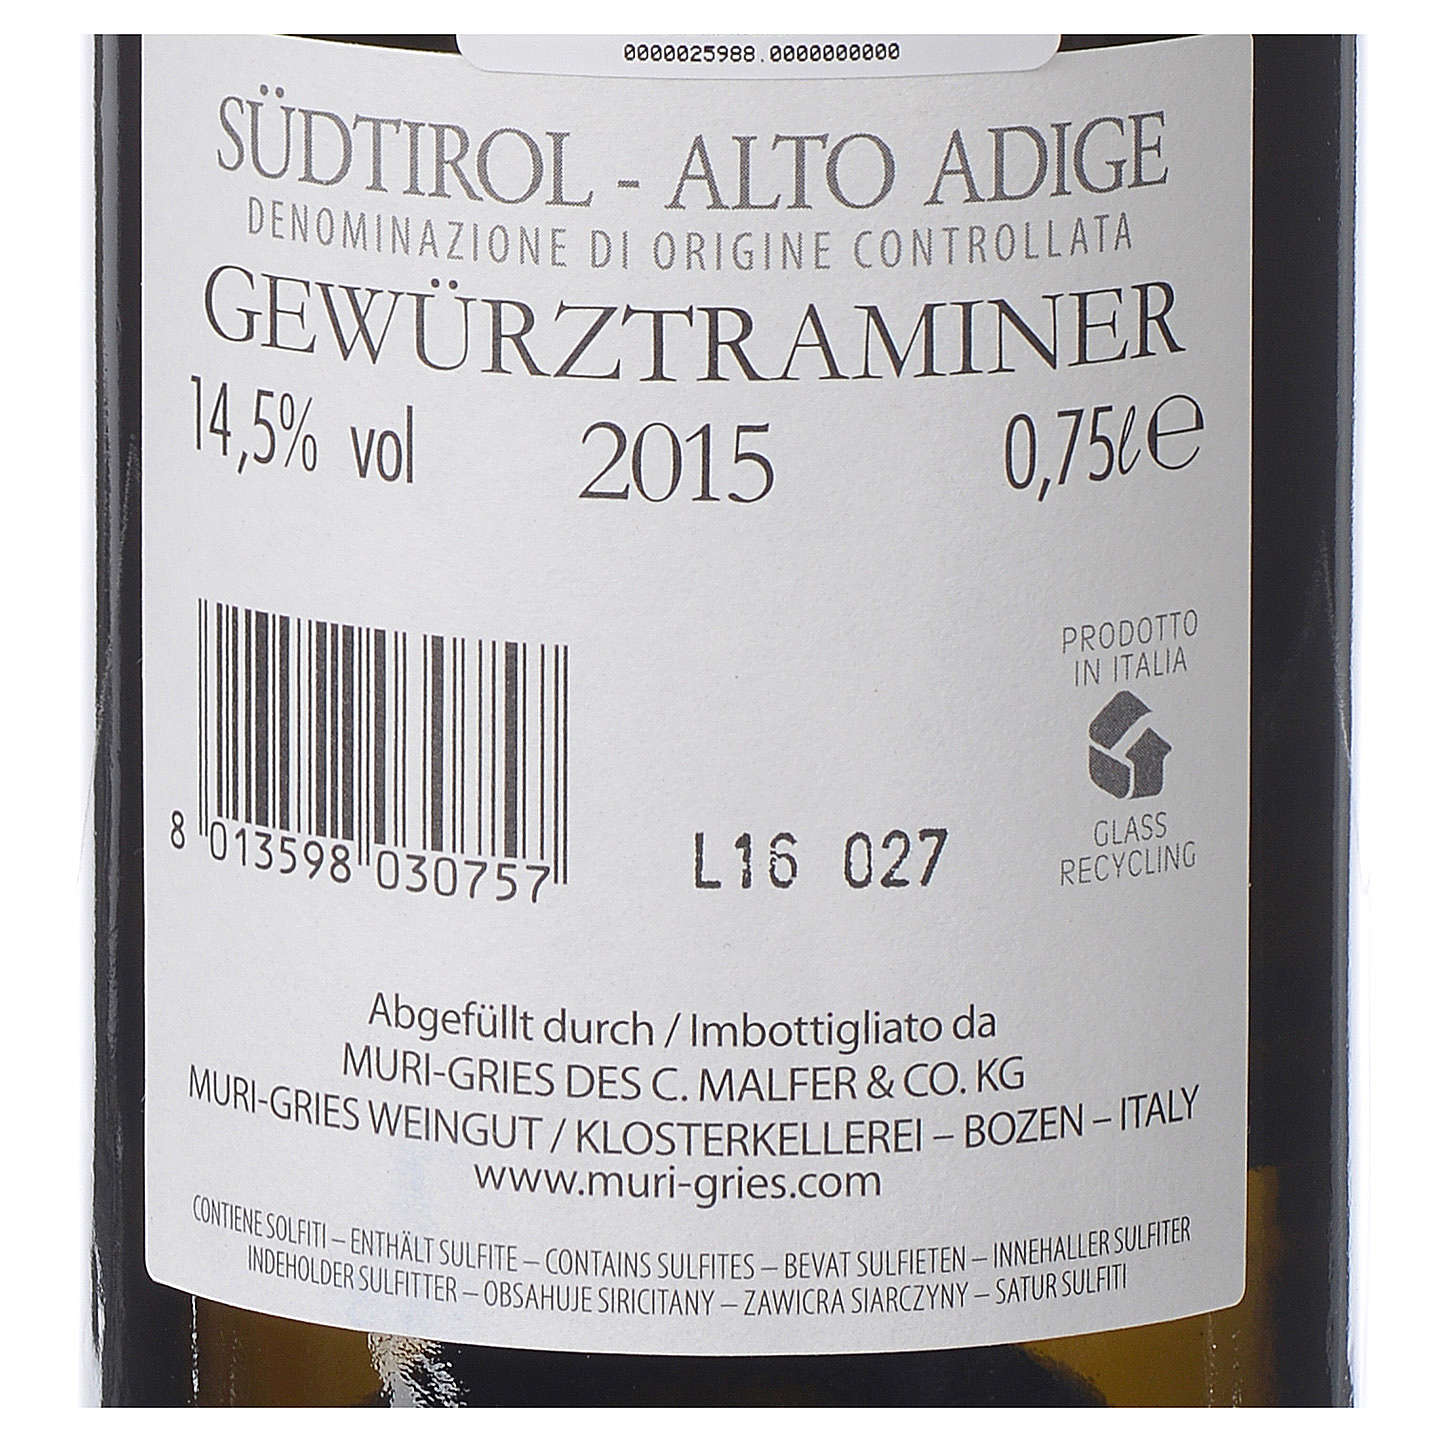 Traminer Aromatico DOC white wine Muri Gries Abbey 2015 3